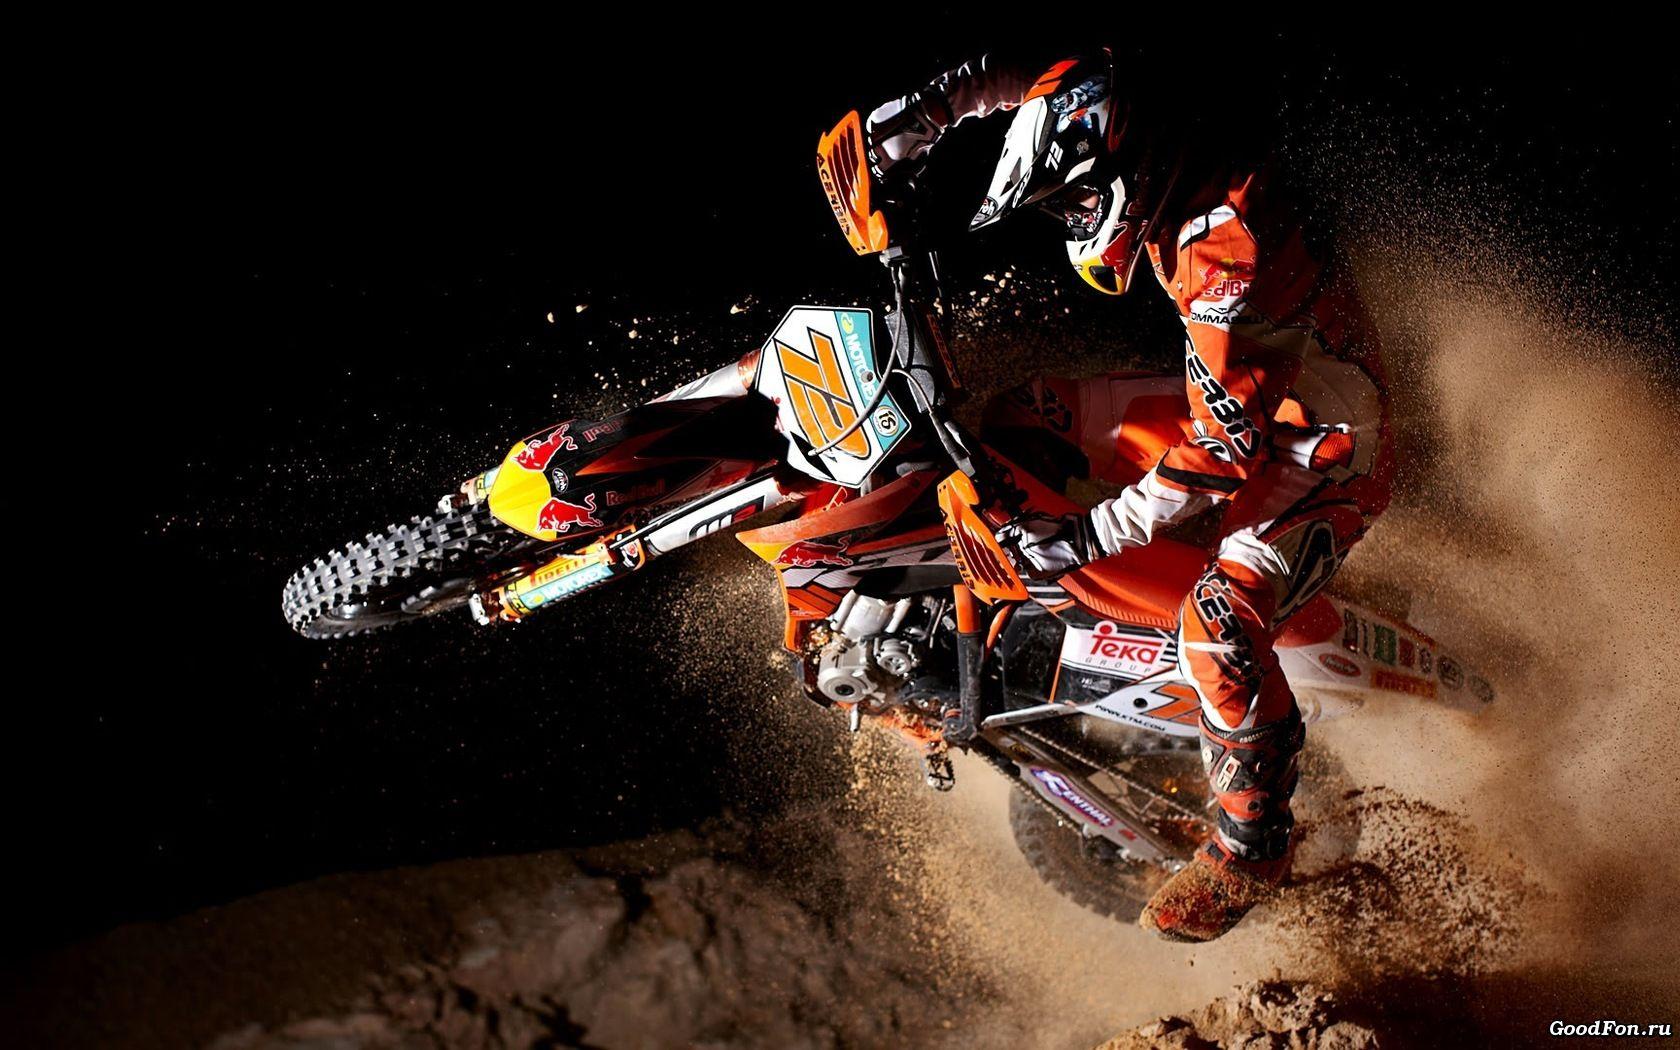 Ktm Motocross Wallpaper Motor Cross Get wallpaper motocross ktm pictures